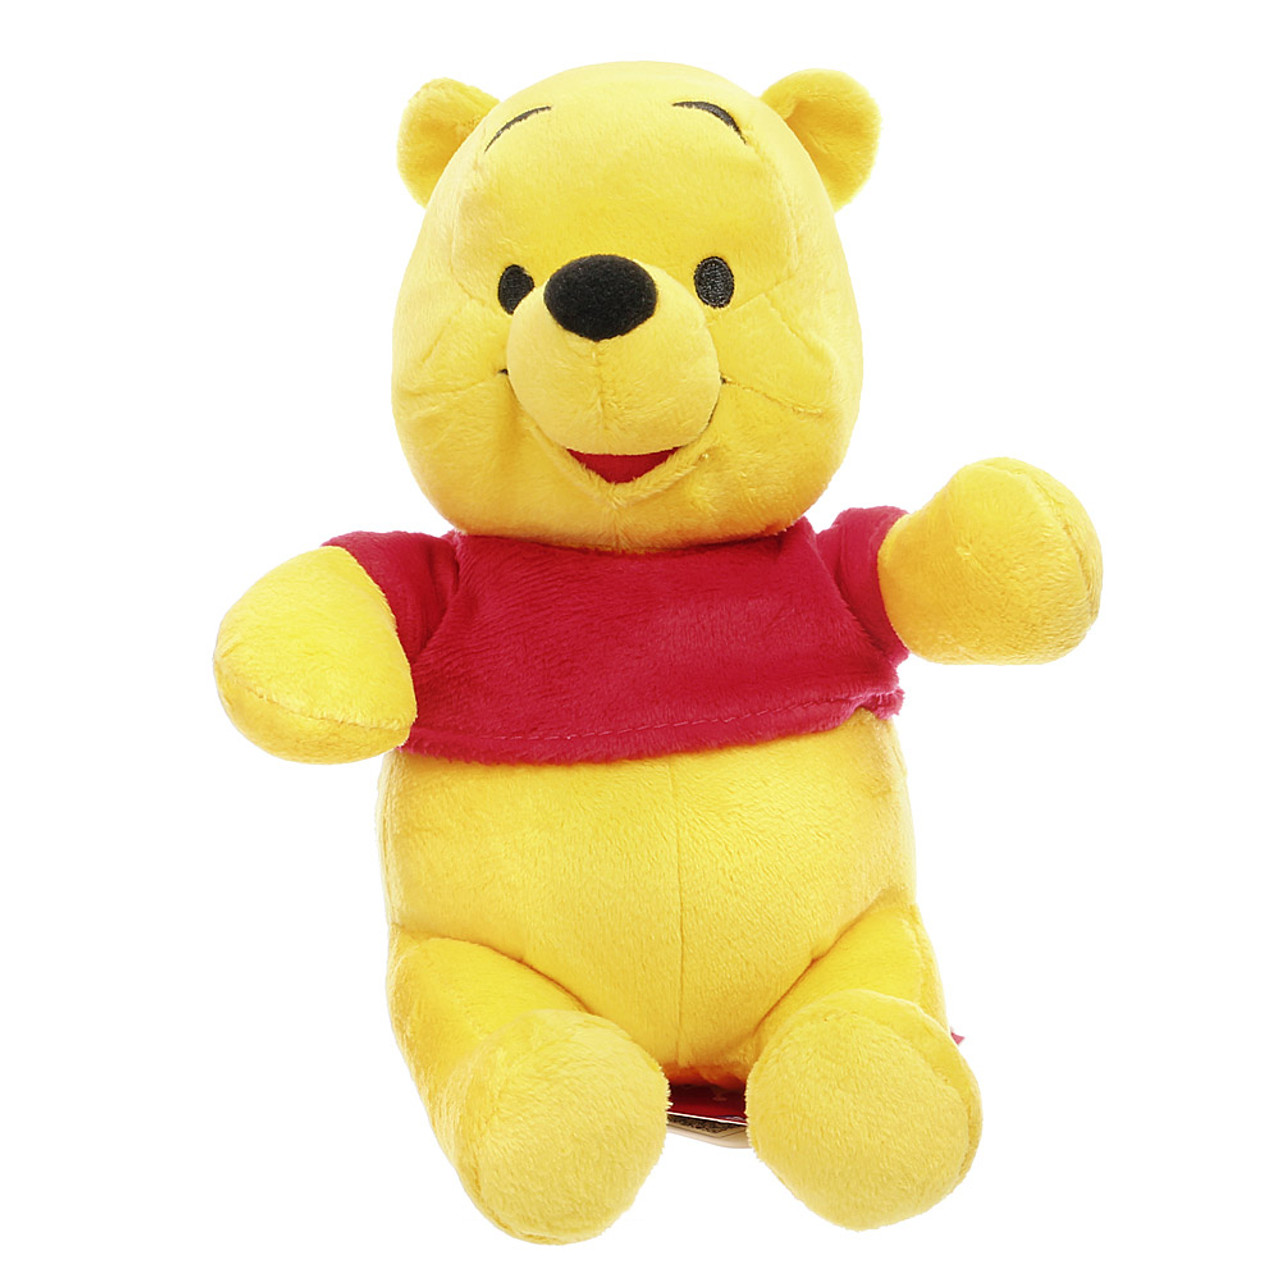 Japan Disney Classic Dears Winnie The Pooh Plush Doll ( Font View ) 2be032dd74c4